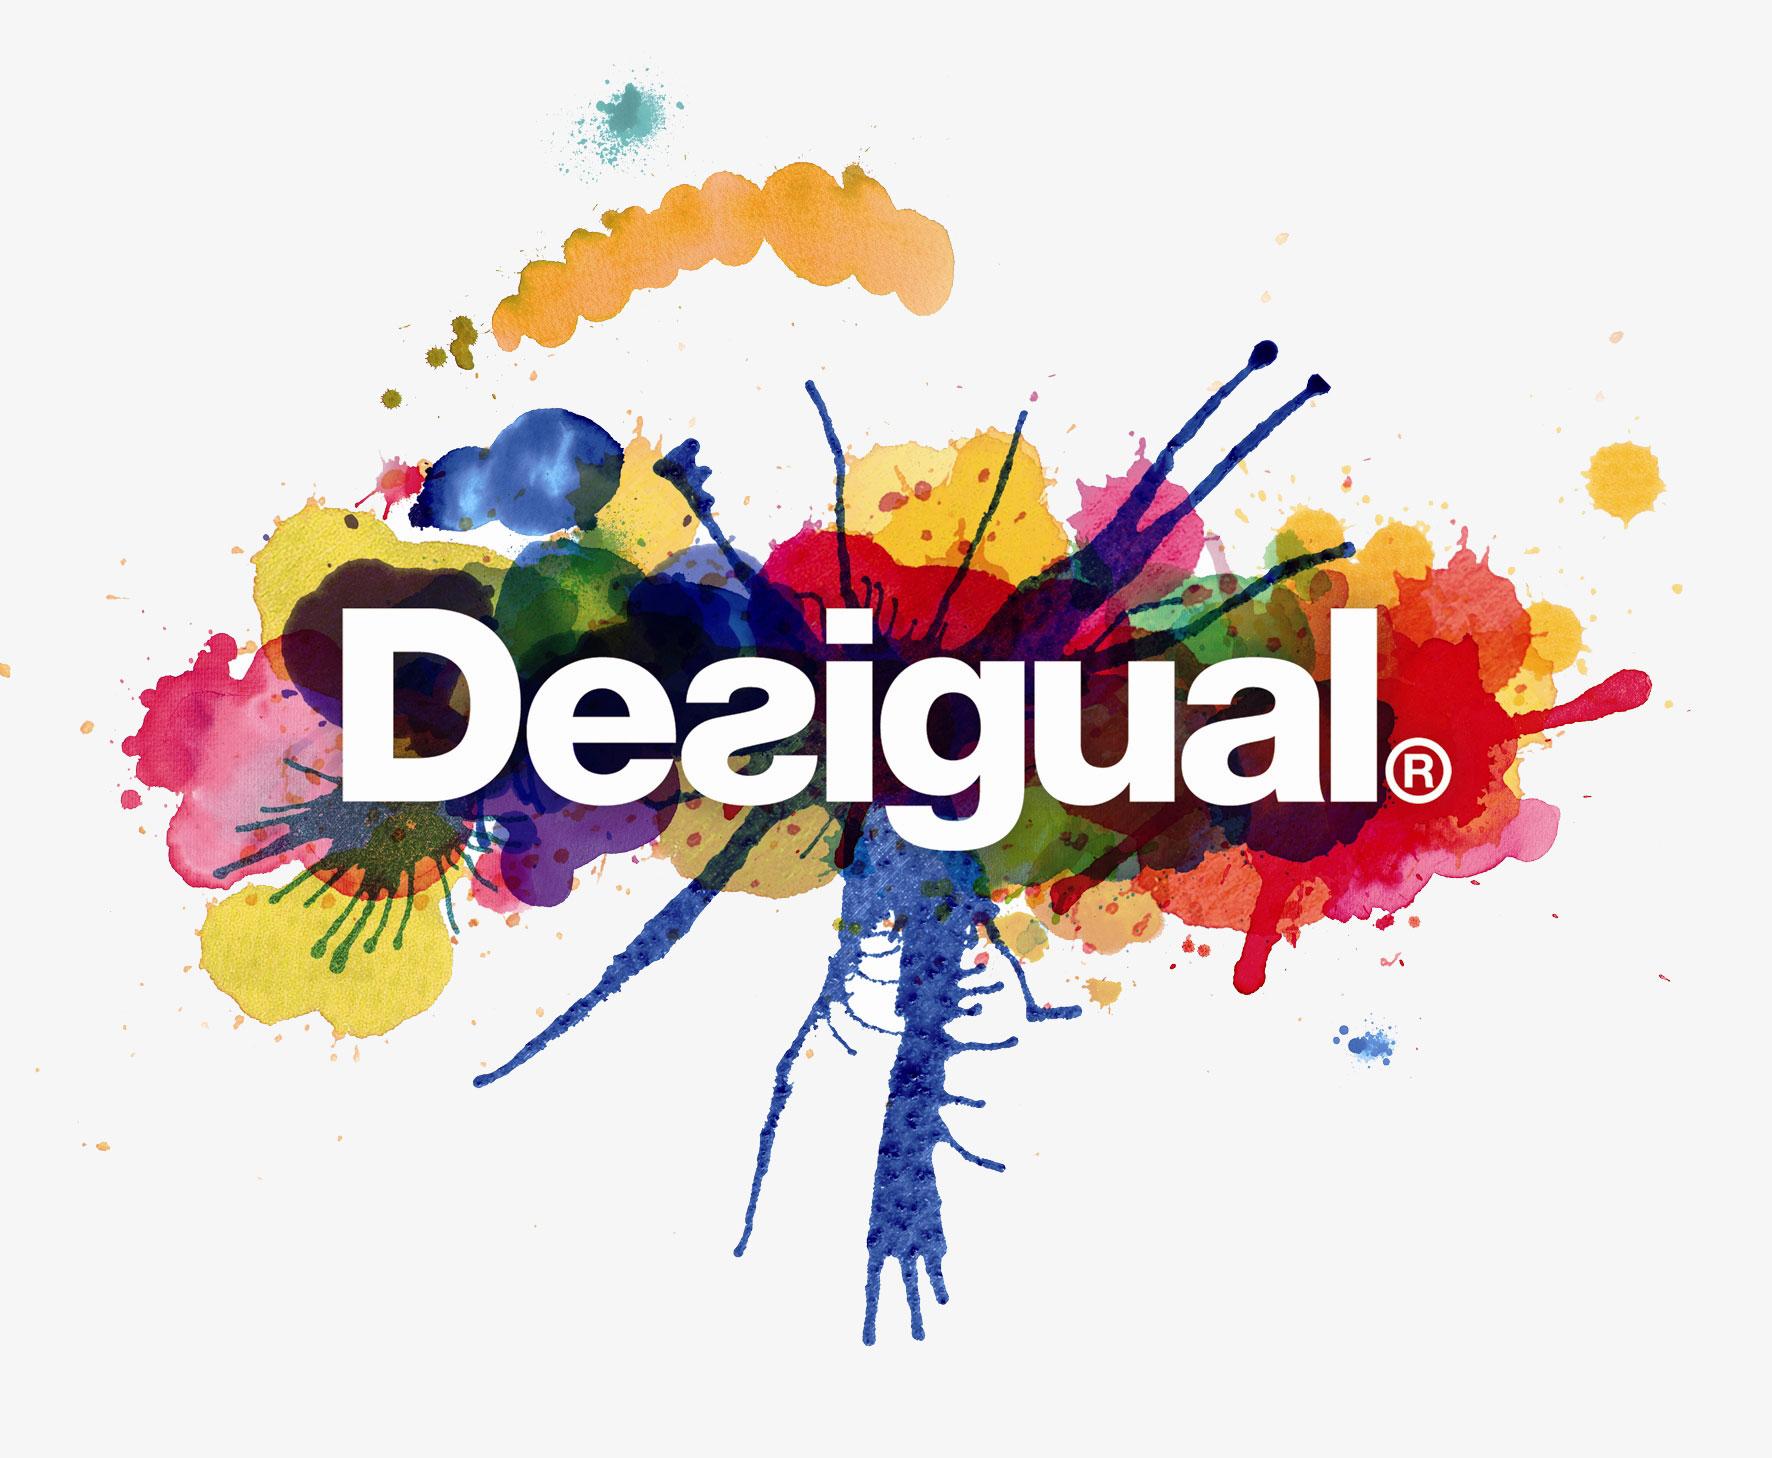 desigual-logo-prod.jpg